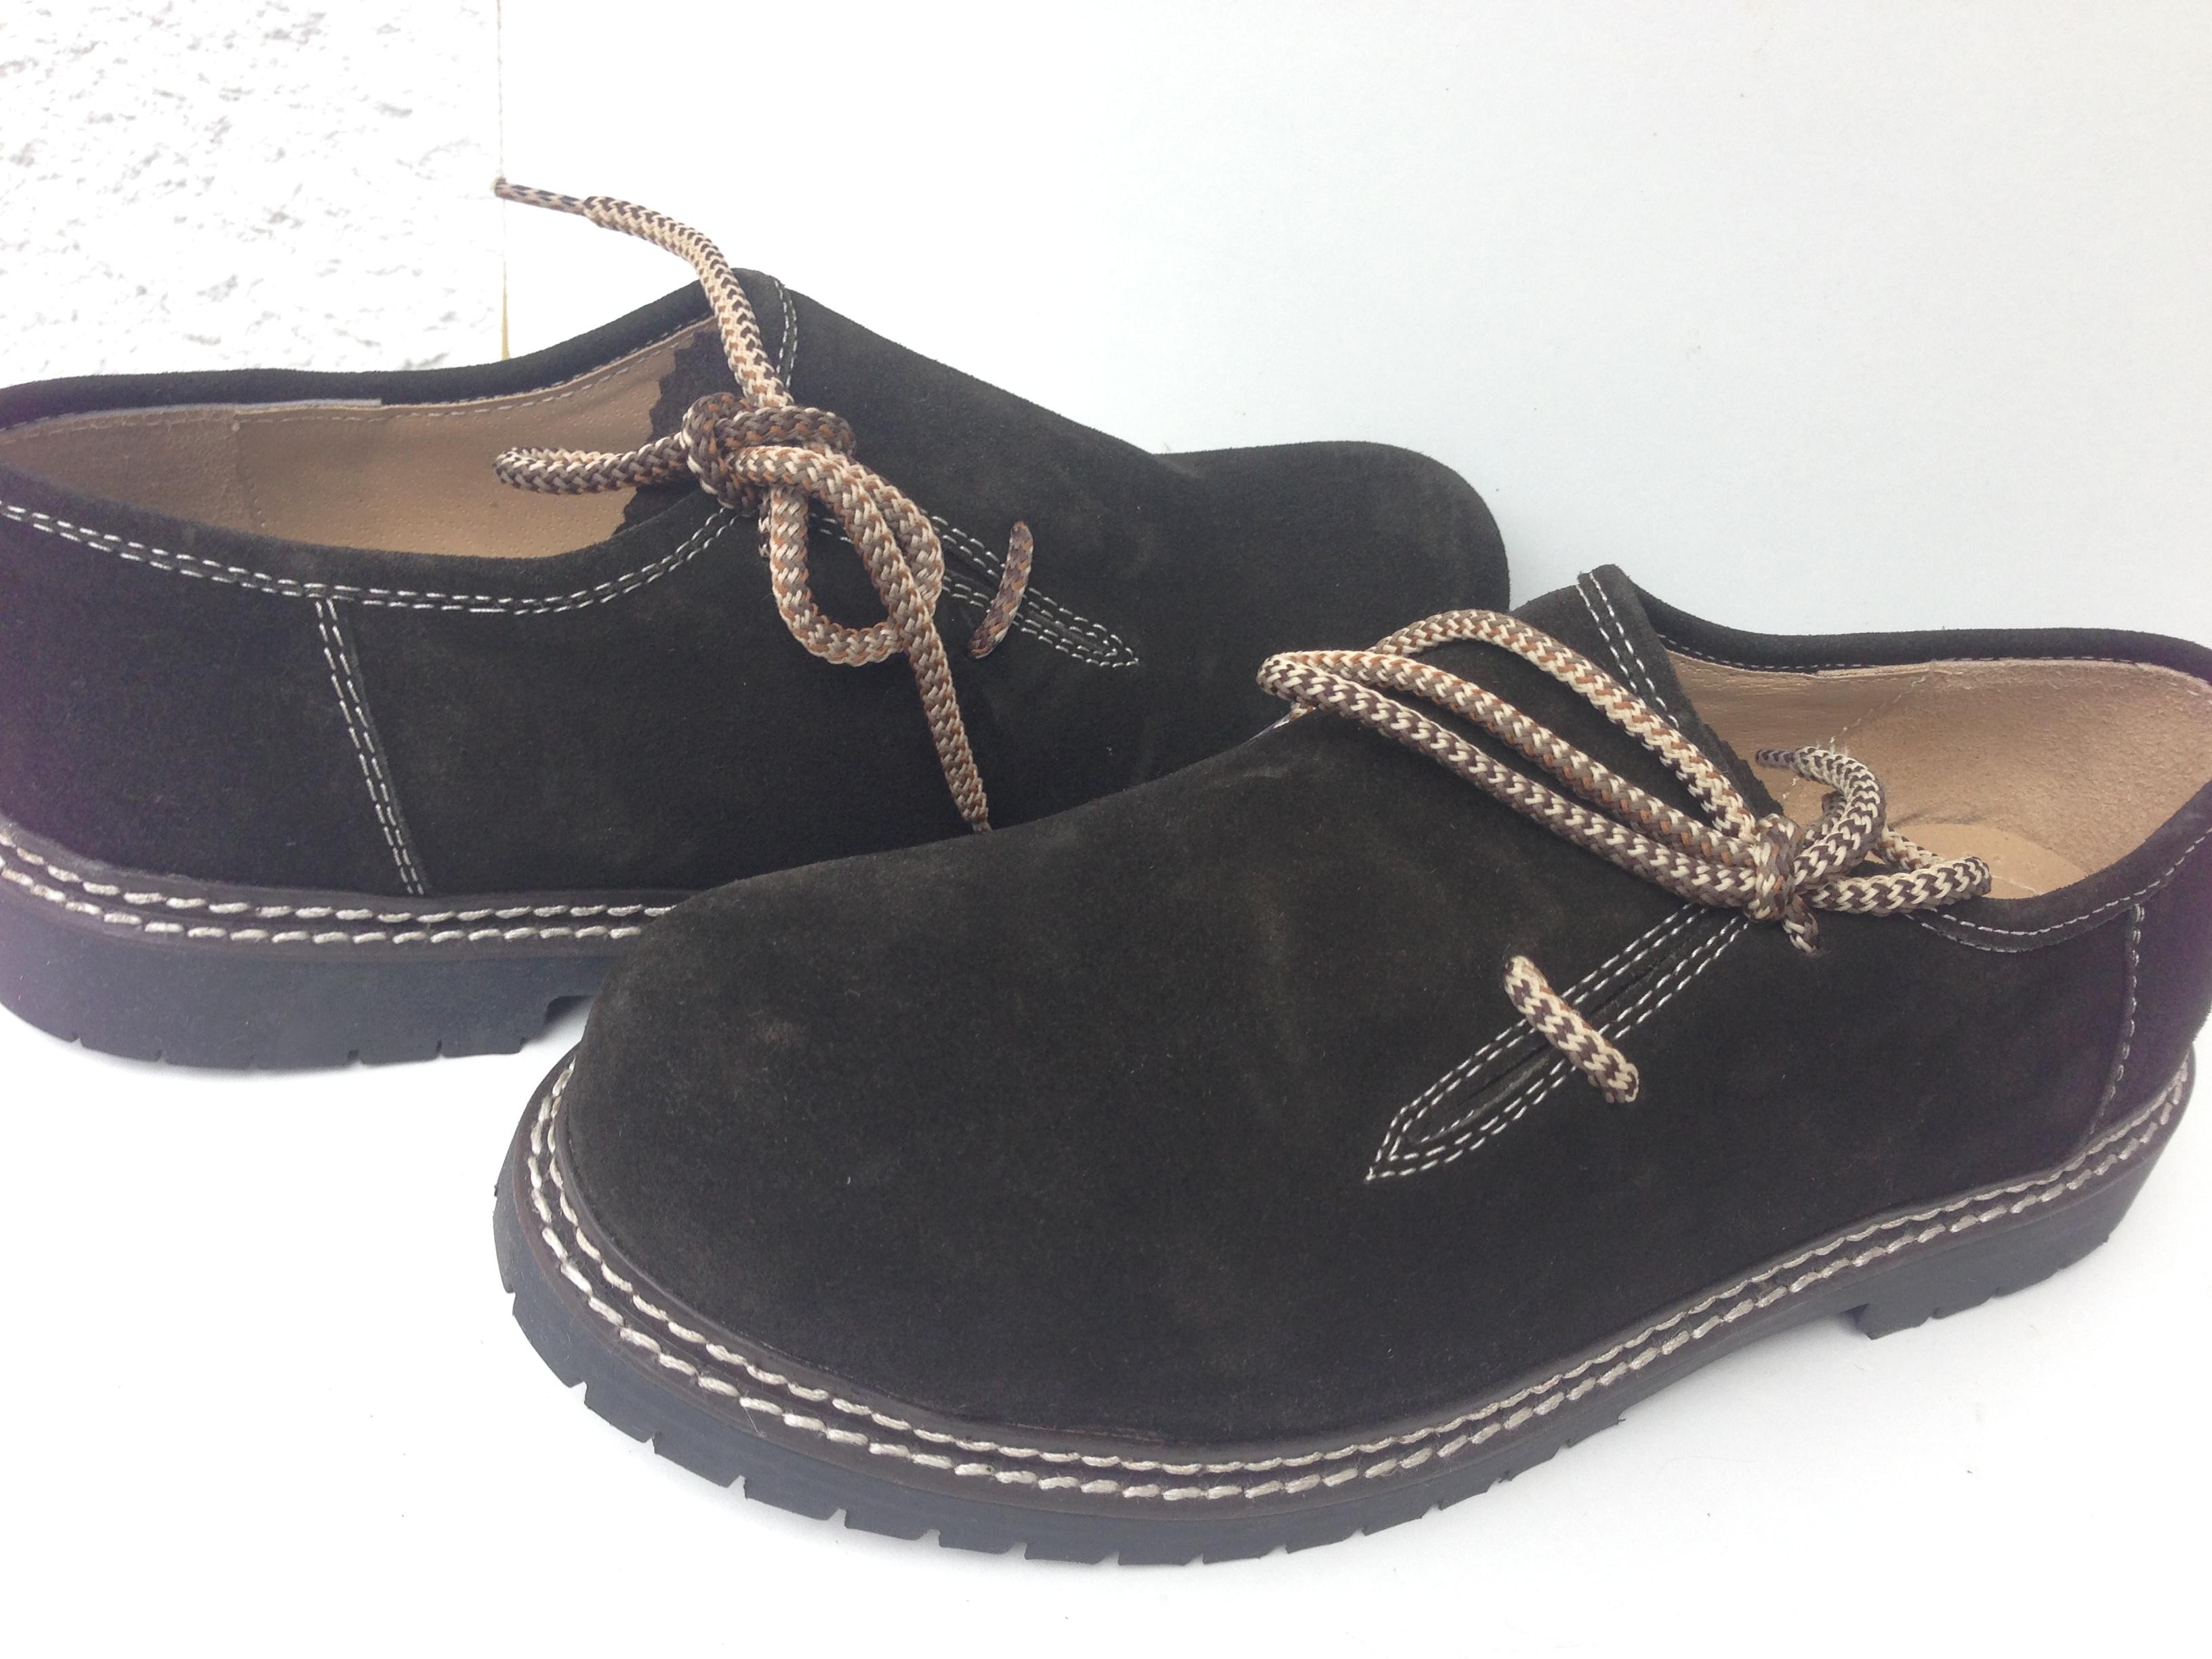 Trachten Set Anzug Herren Lederhose+Träger+Schuhe +Socken+Hemd Dark Braun Leder